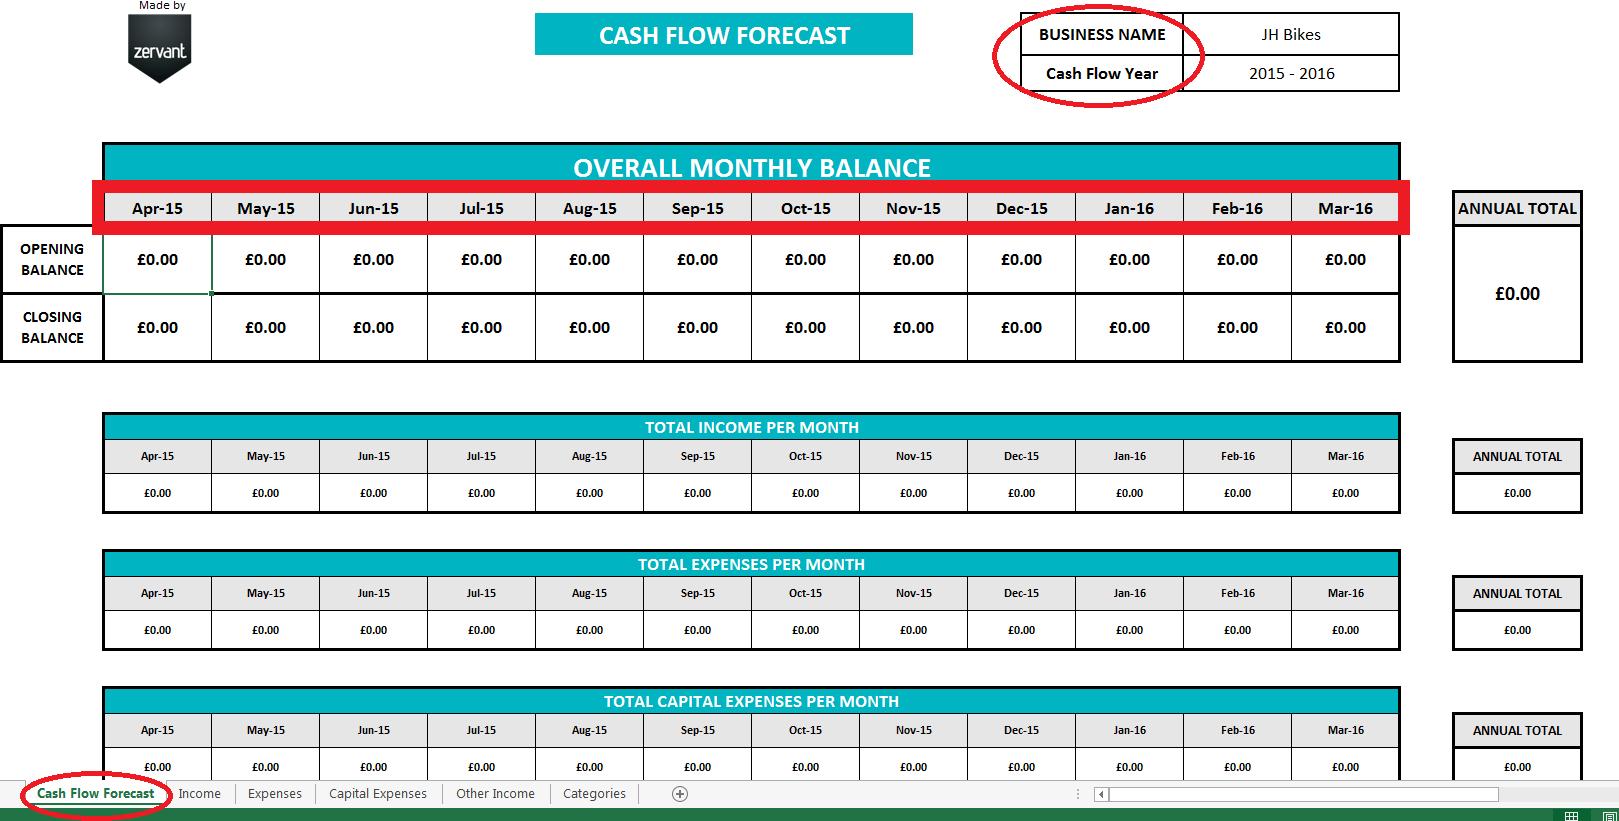 Cash Flow Spreadsheet Template Free Regarding Free Uk Cash Flow Template  Zervant Blog